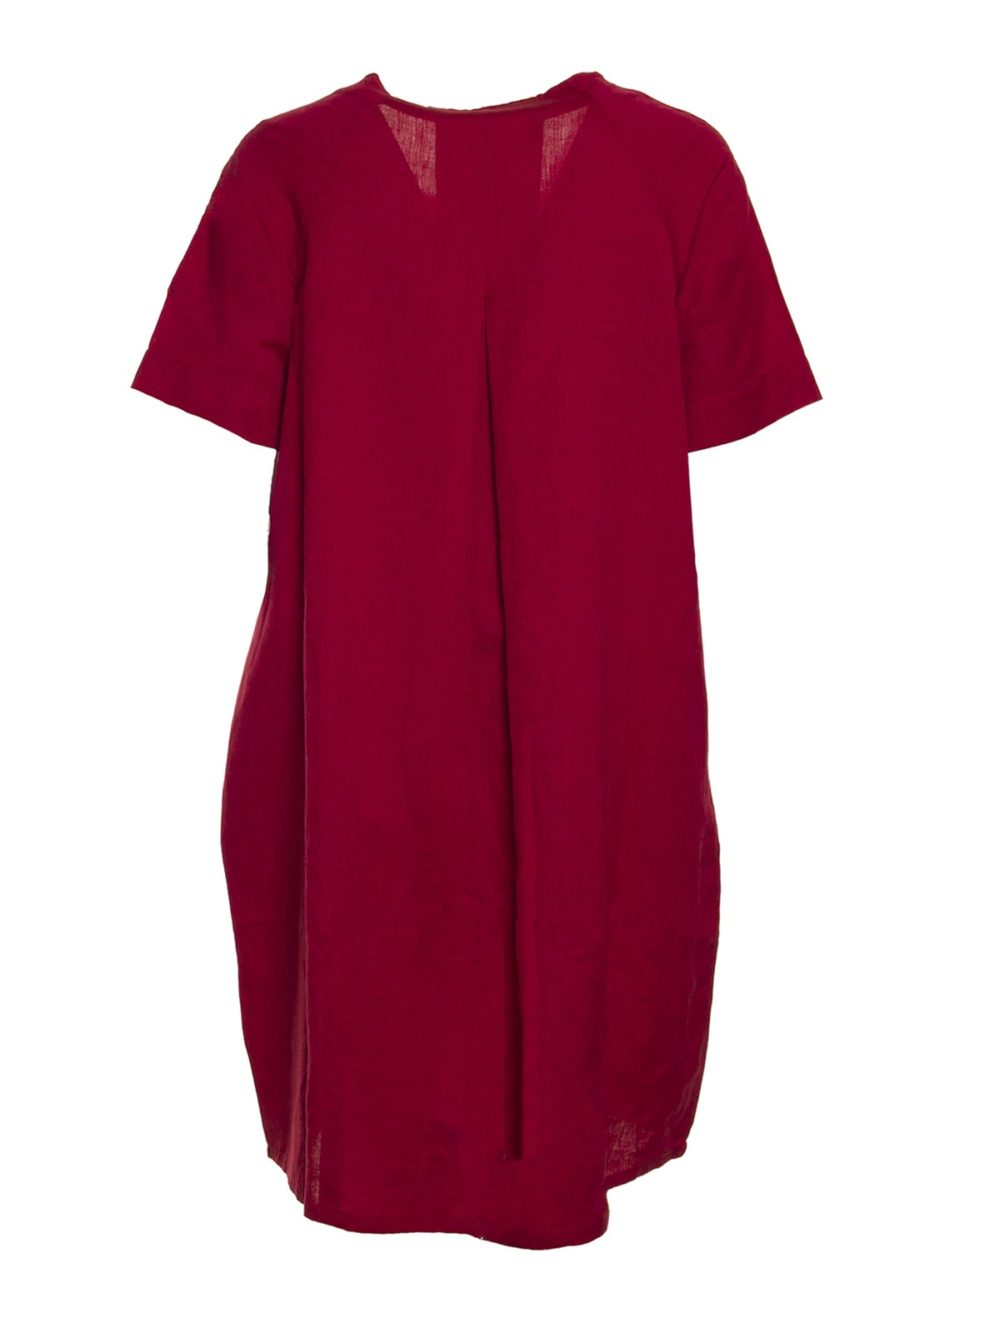 Laica Dress Two Danes Katie Kerr Women's Clothing